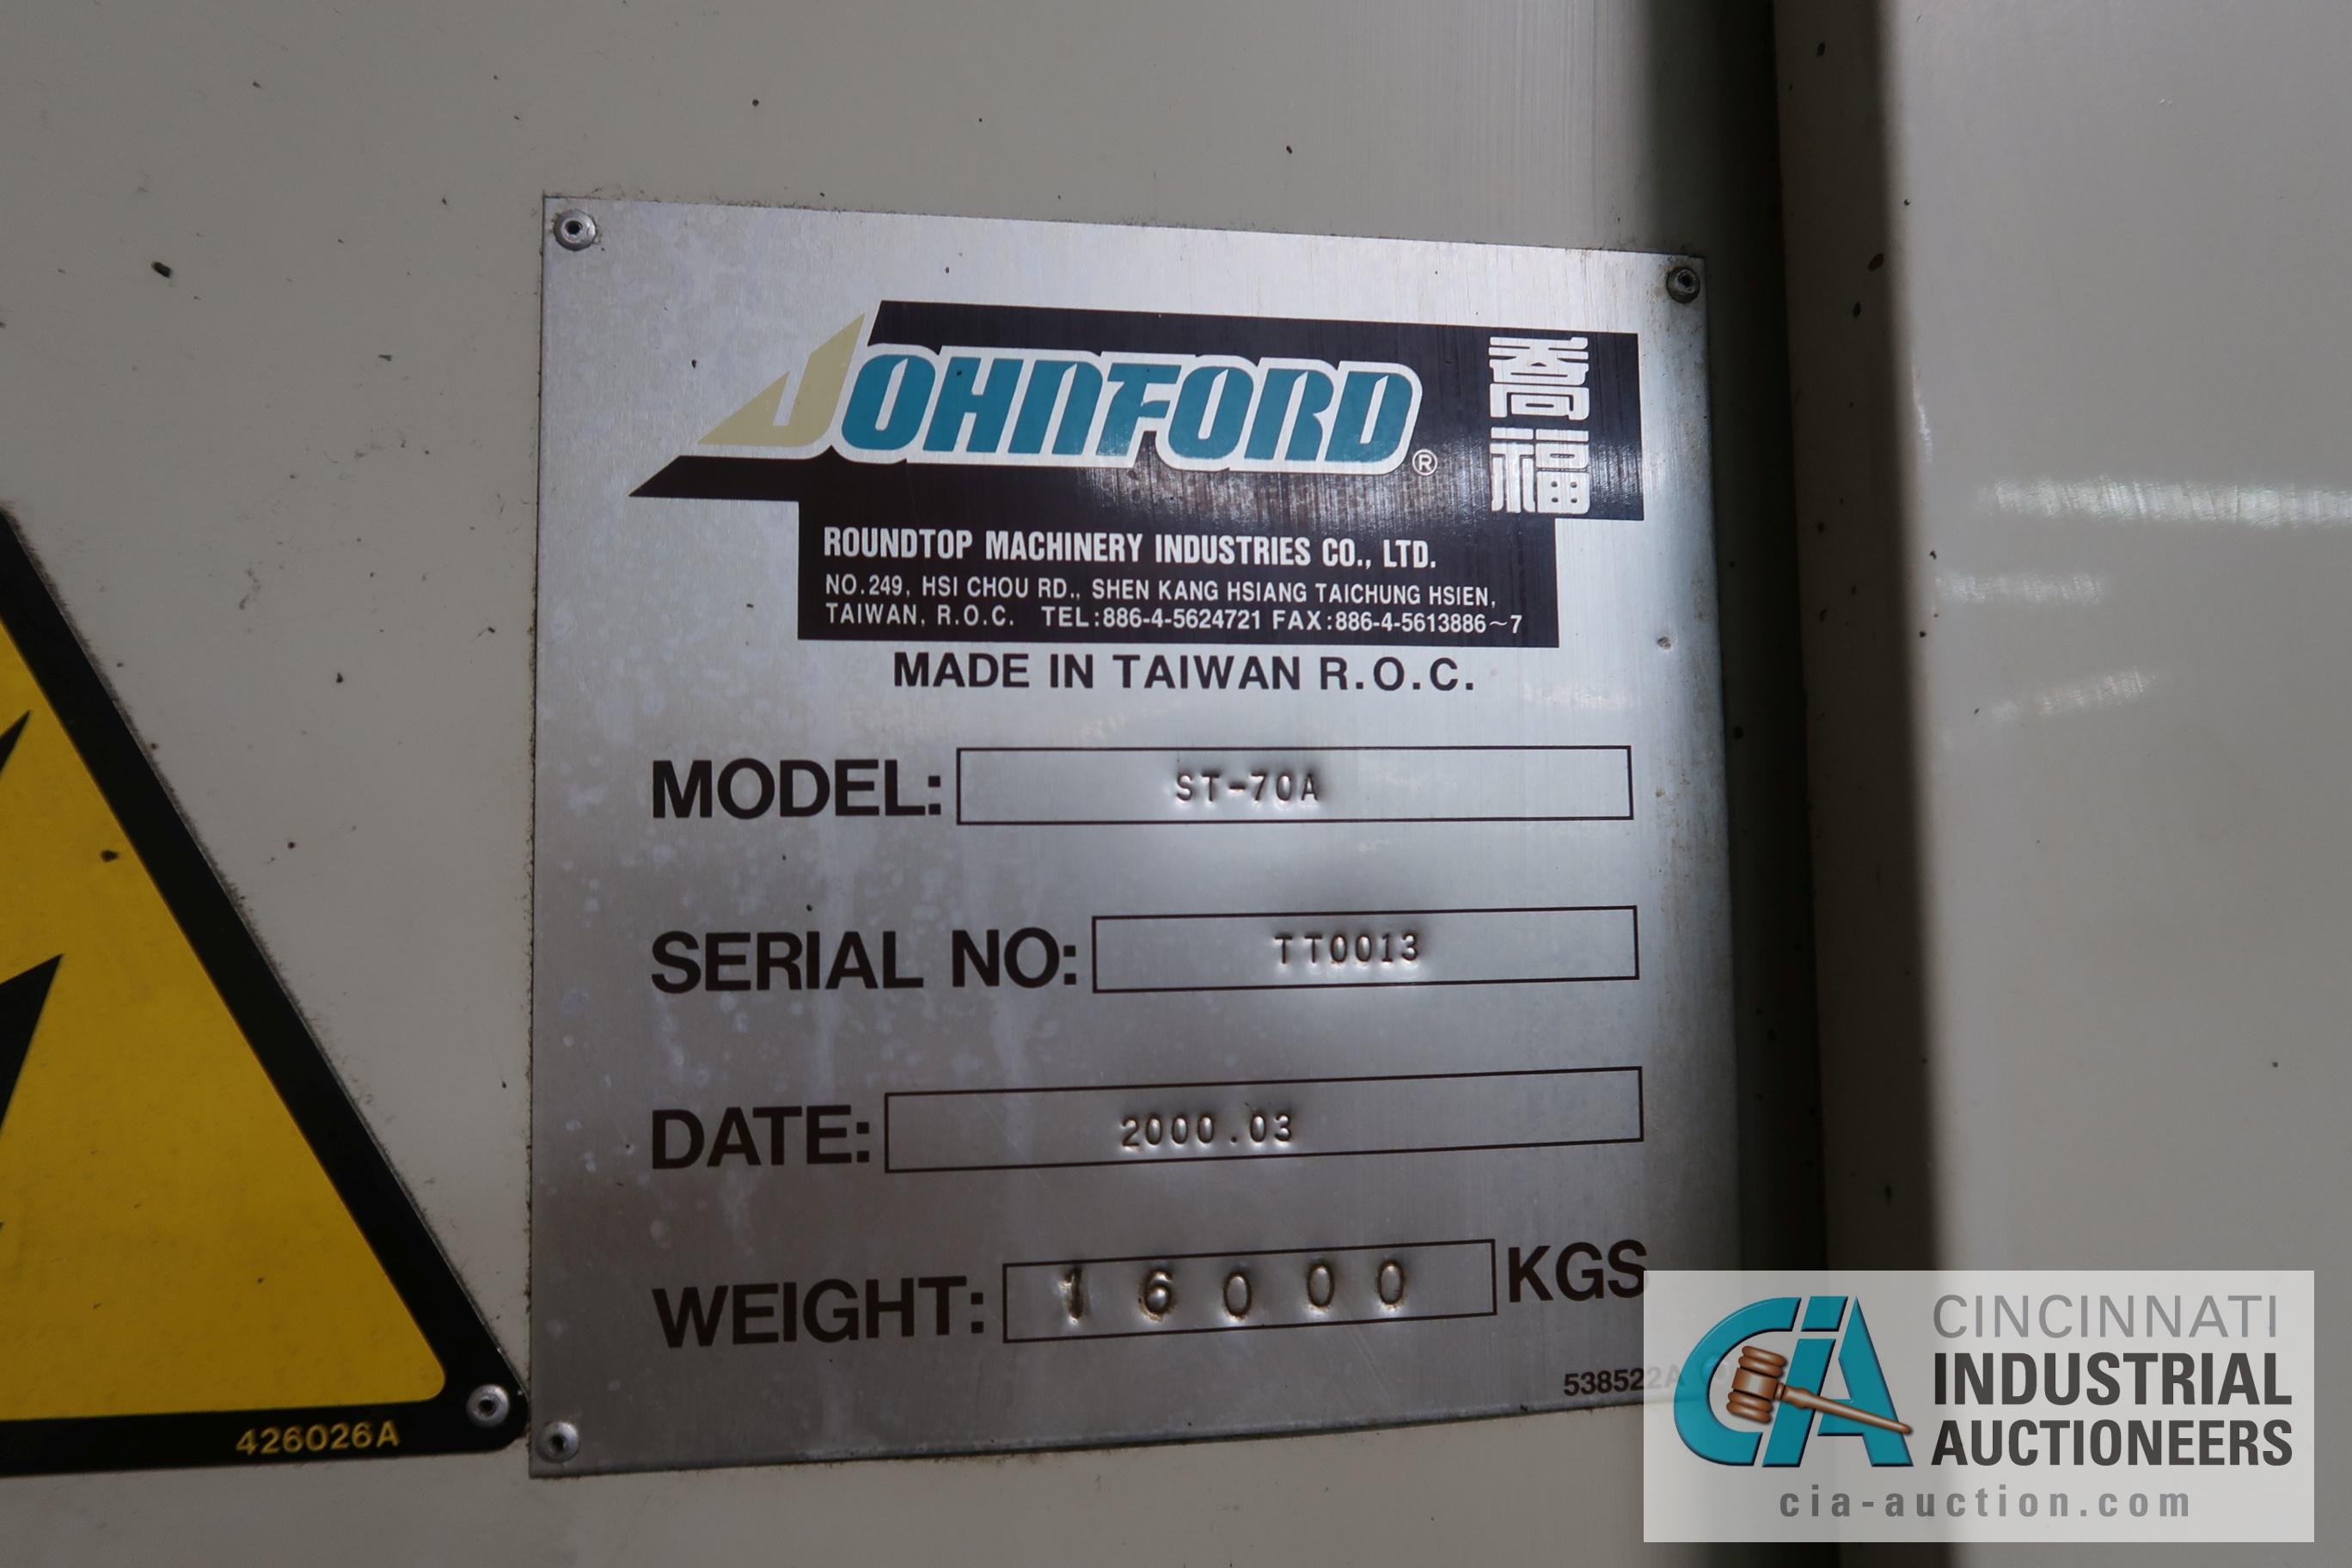 "JOHNFORD MODEL ST-70 SLANT BED CNC LATHE; S/N TT0013 (NEW 2000), 12"" CHUCK, 36"" SWING OVER BED, - Image 18 of 21"